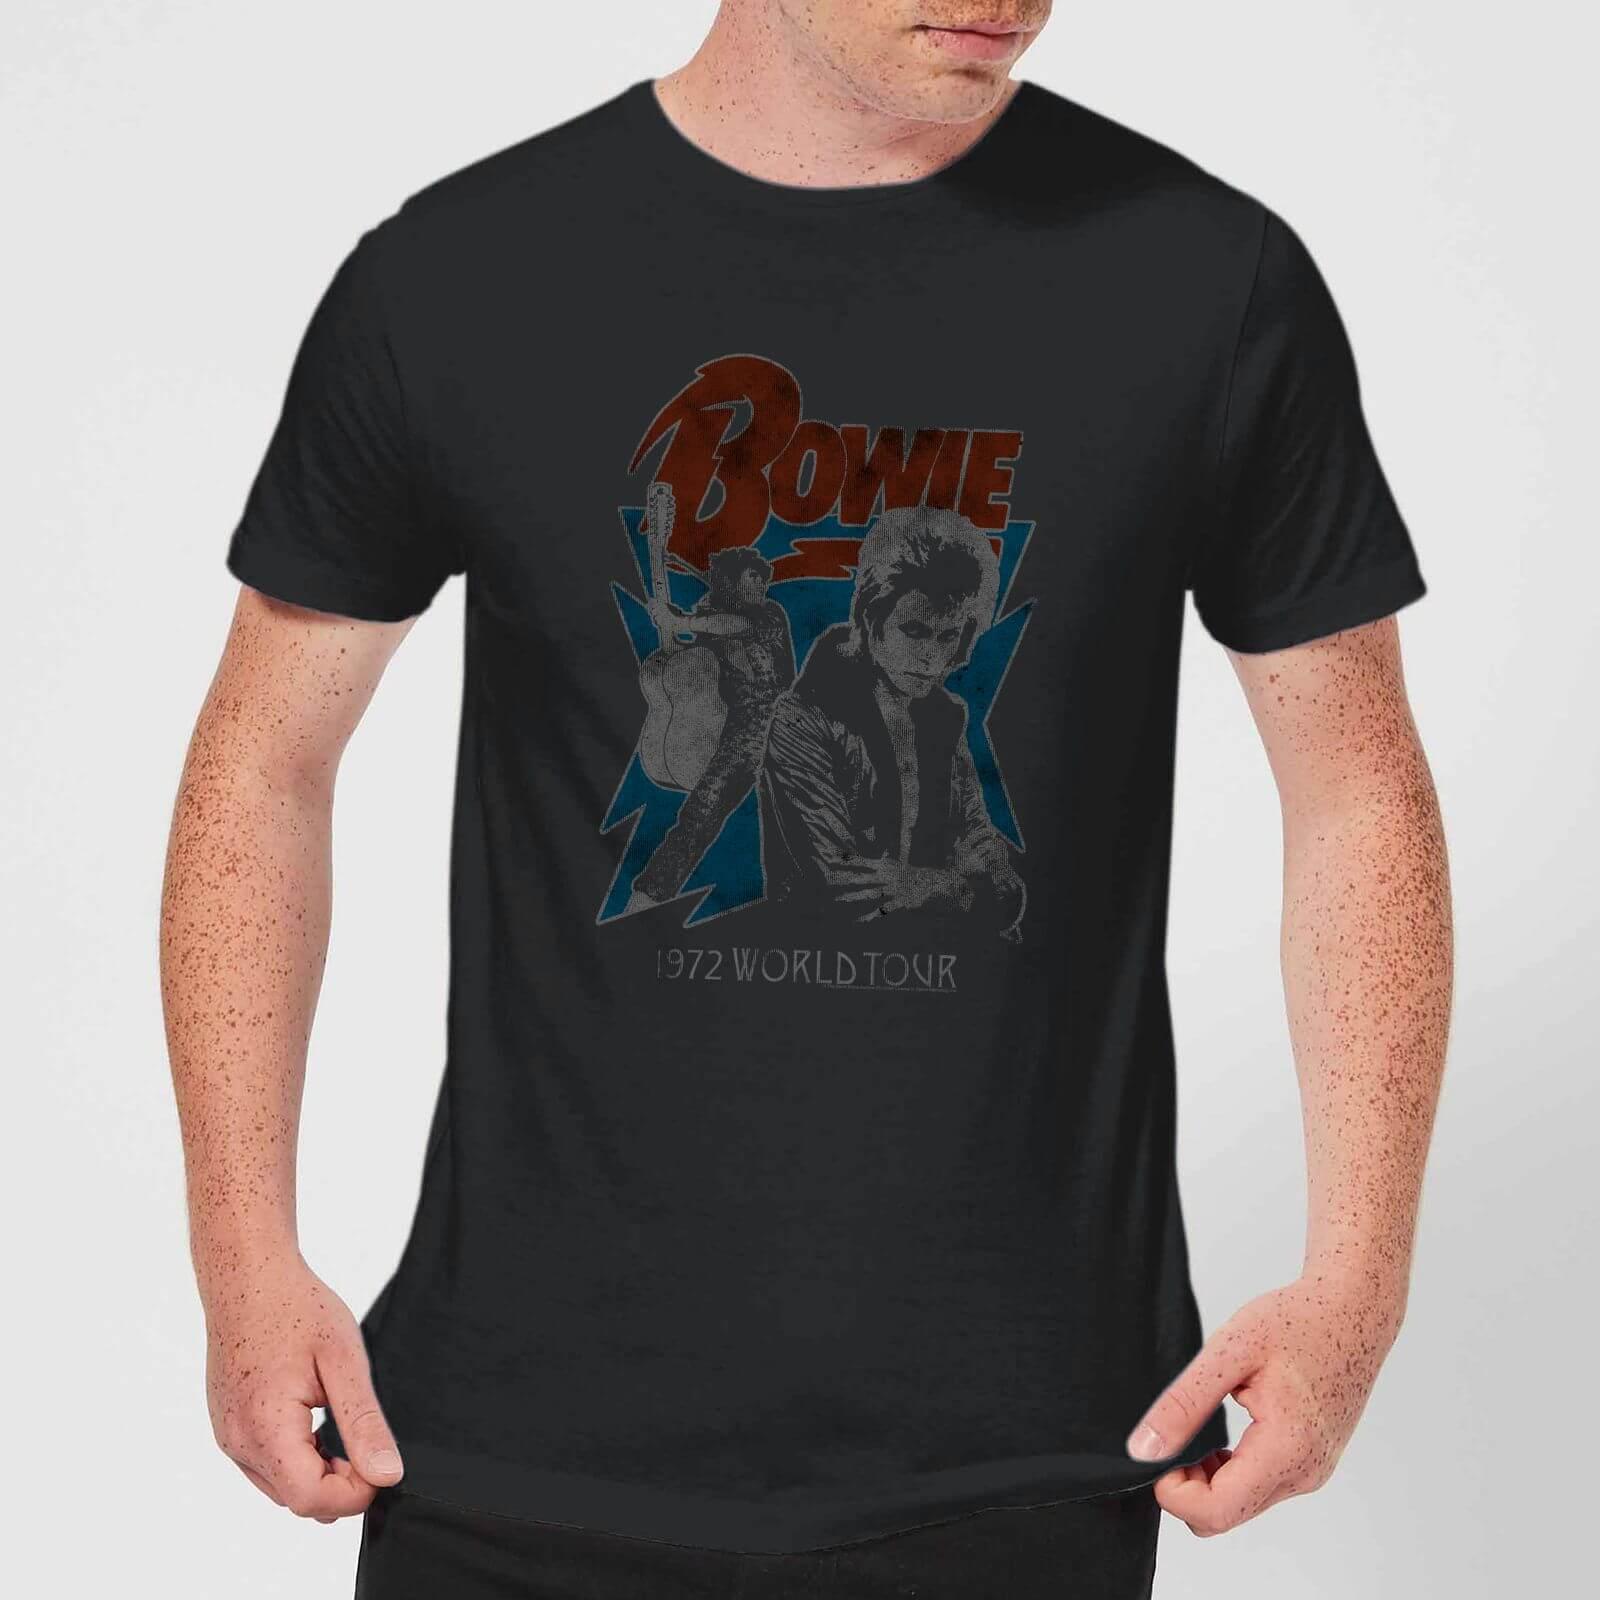 David Bowie 72 Tour Men's T-Shirt - Black - 5XL - Schwarz